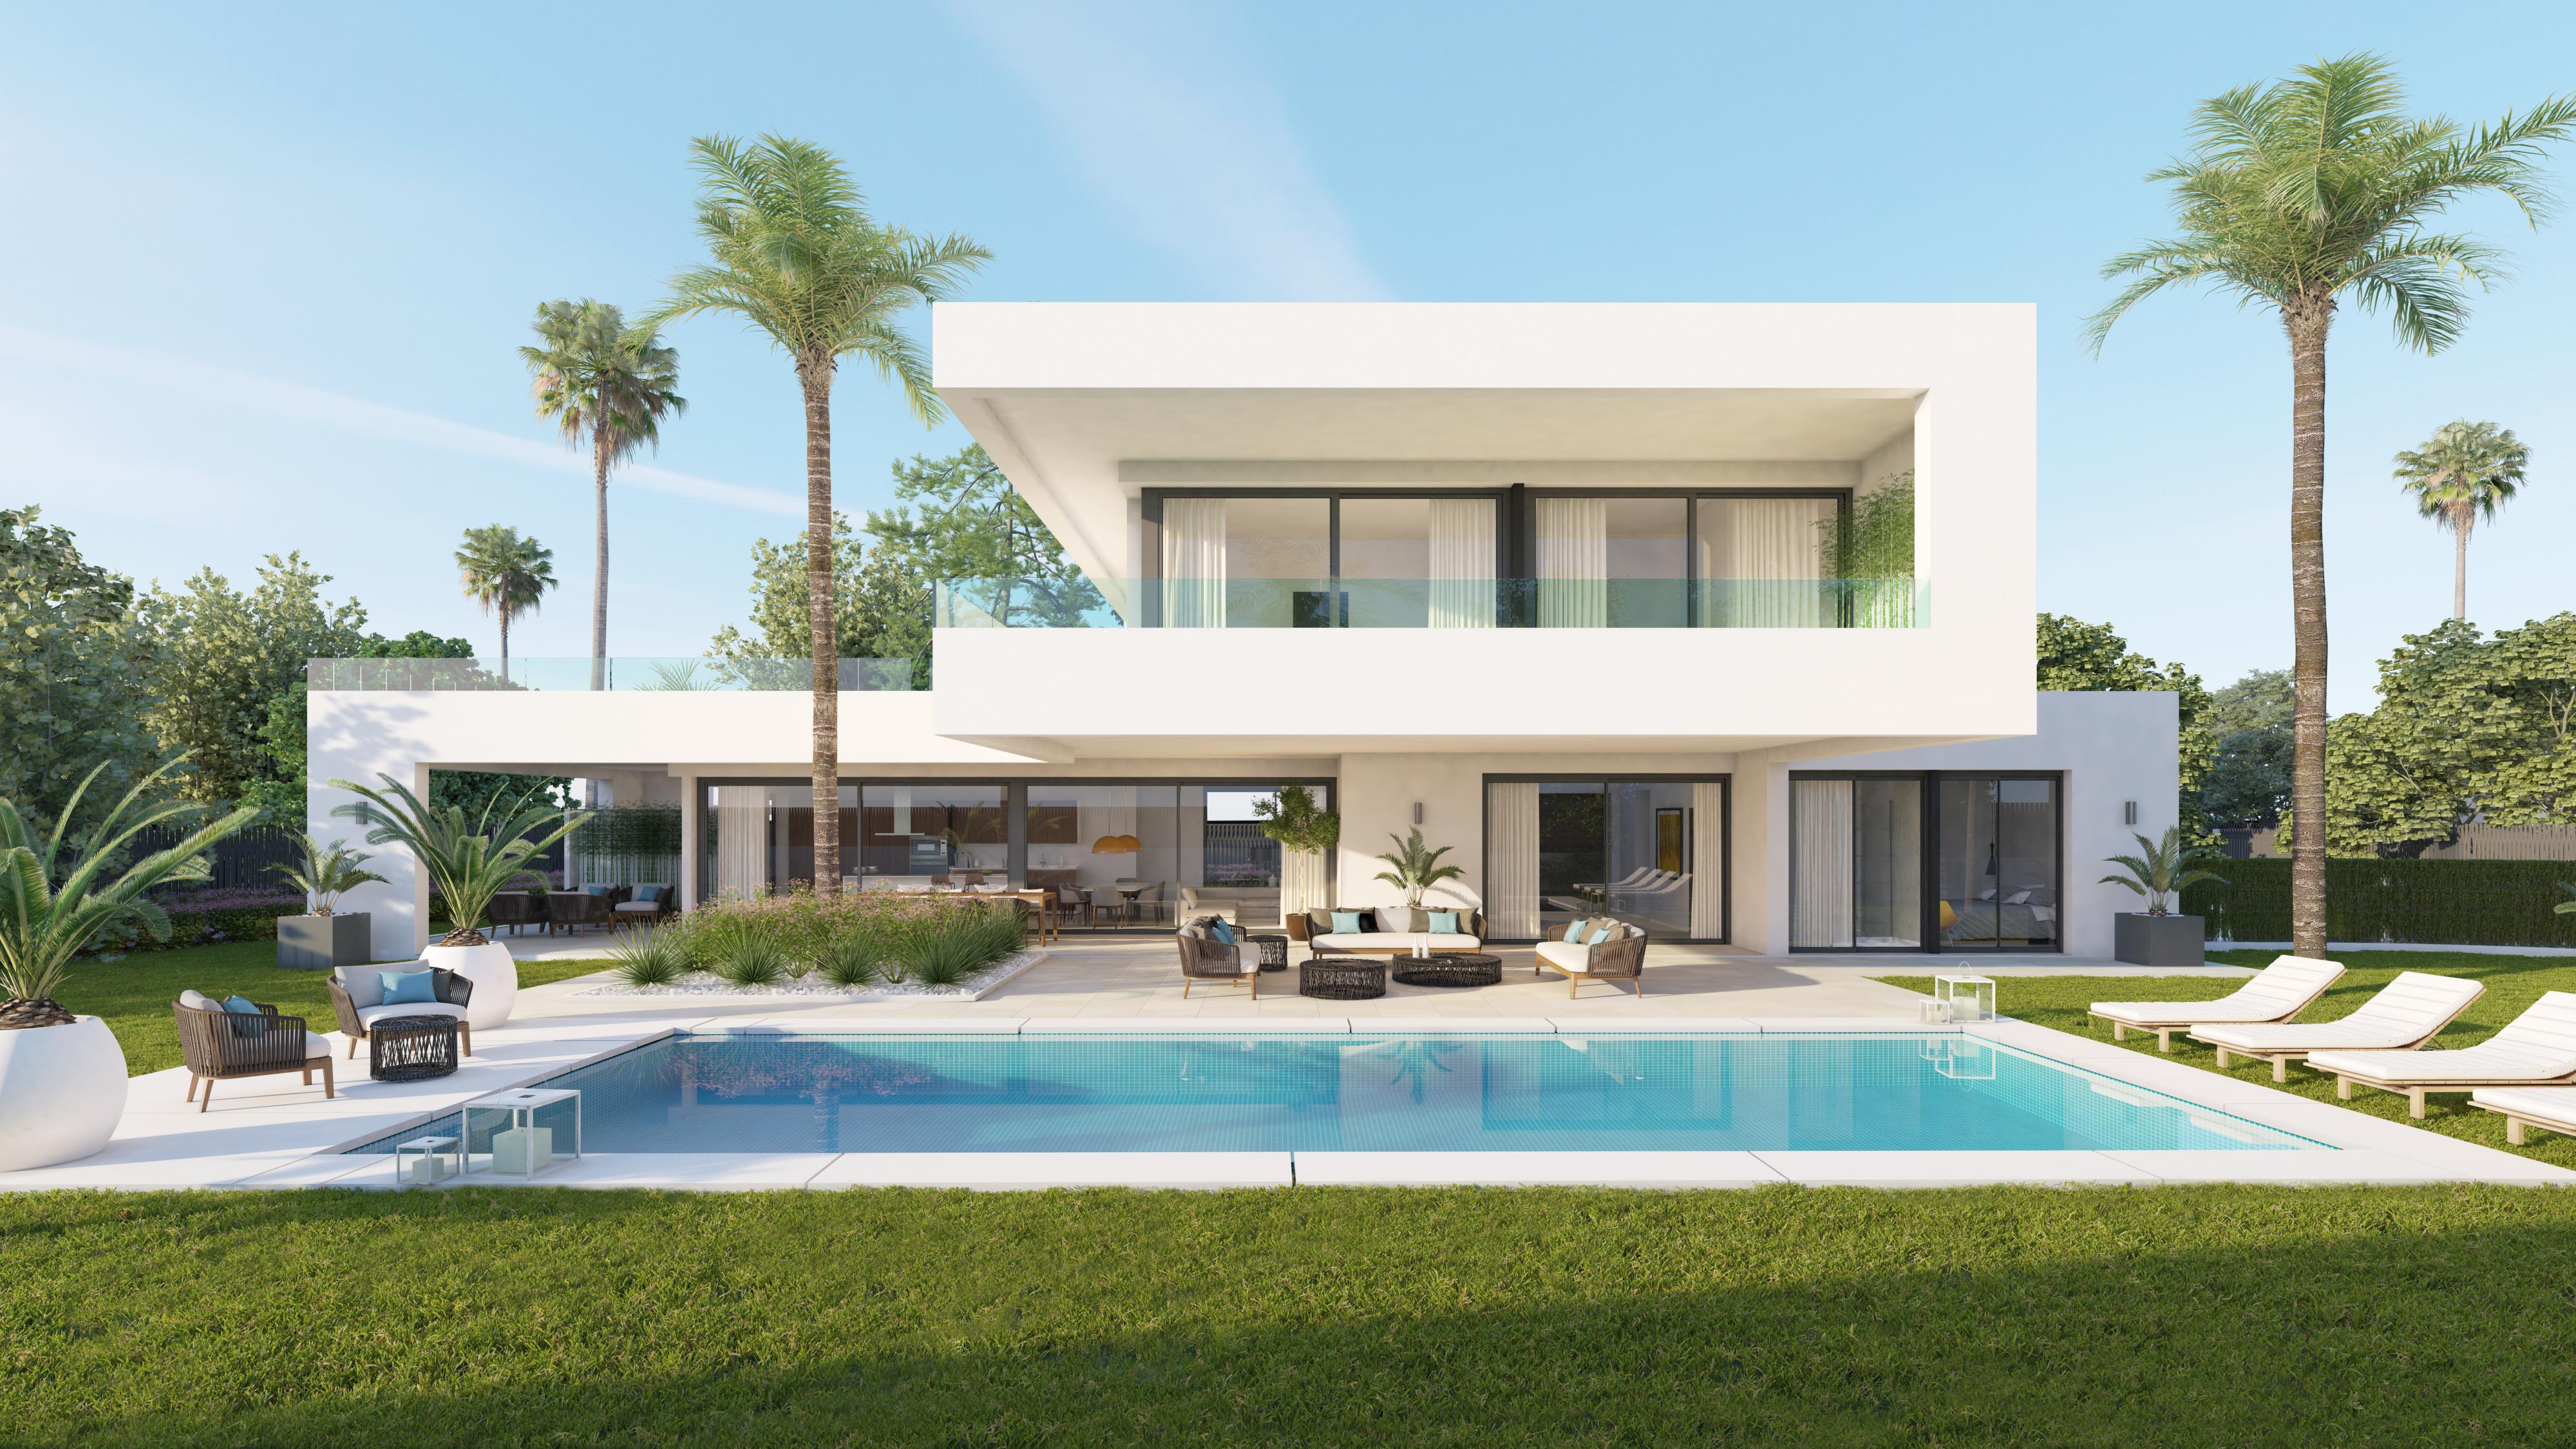 LUX0172: Villa in Marbella